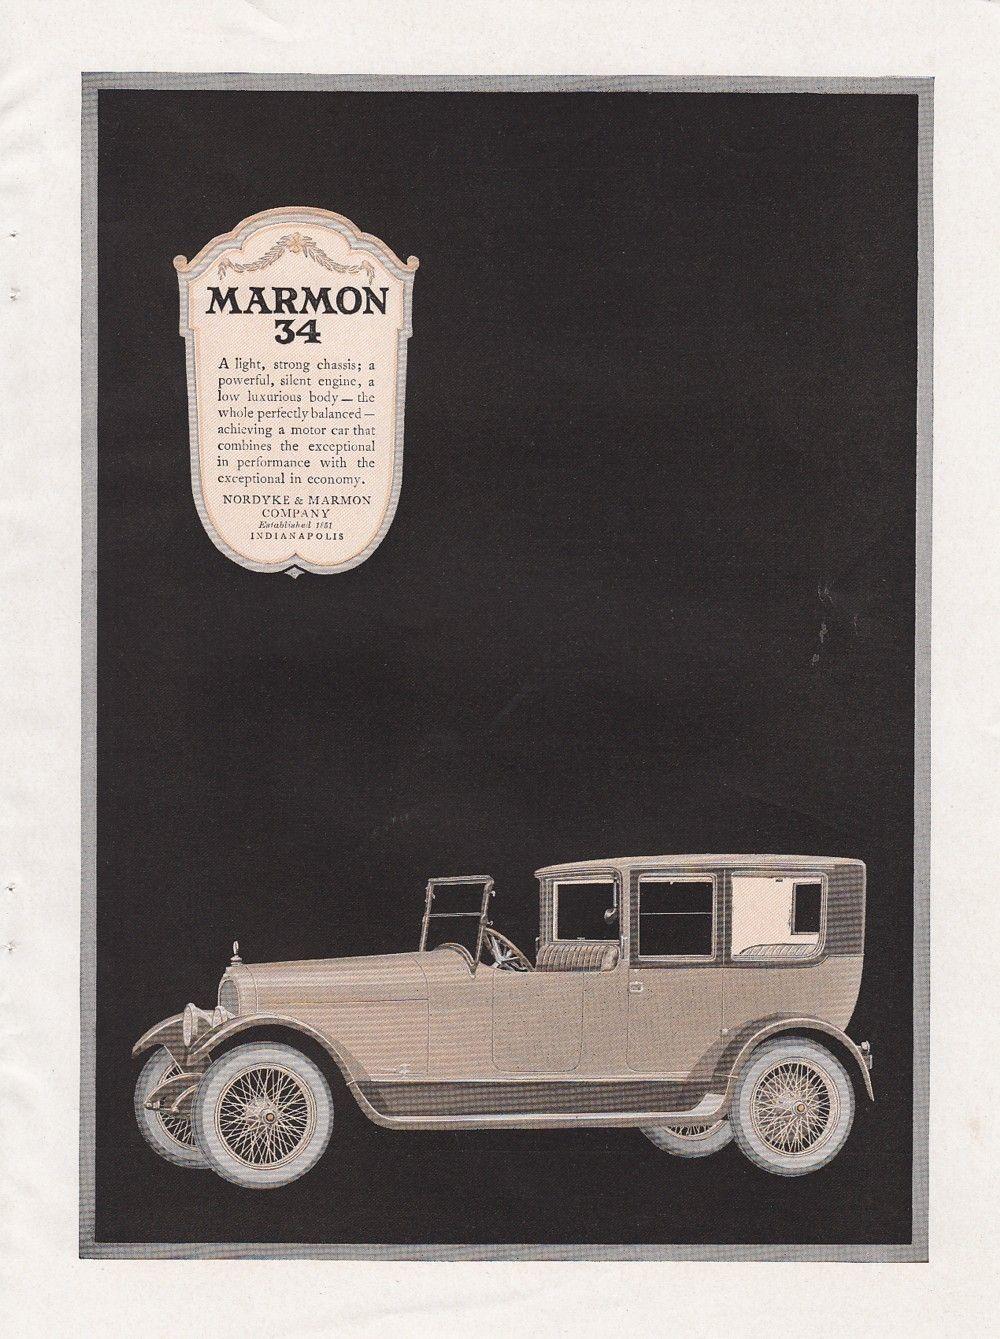 1919 nordyke marmon co indianapolis in ad the marmon 34 automobile car